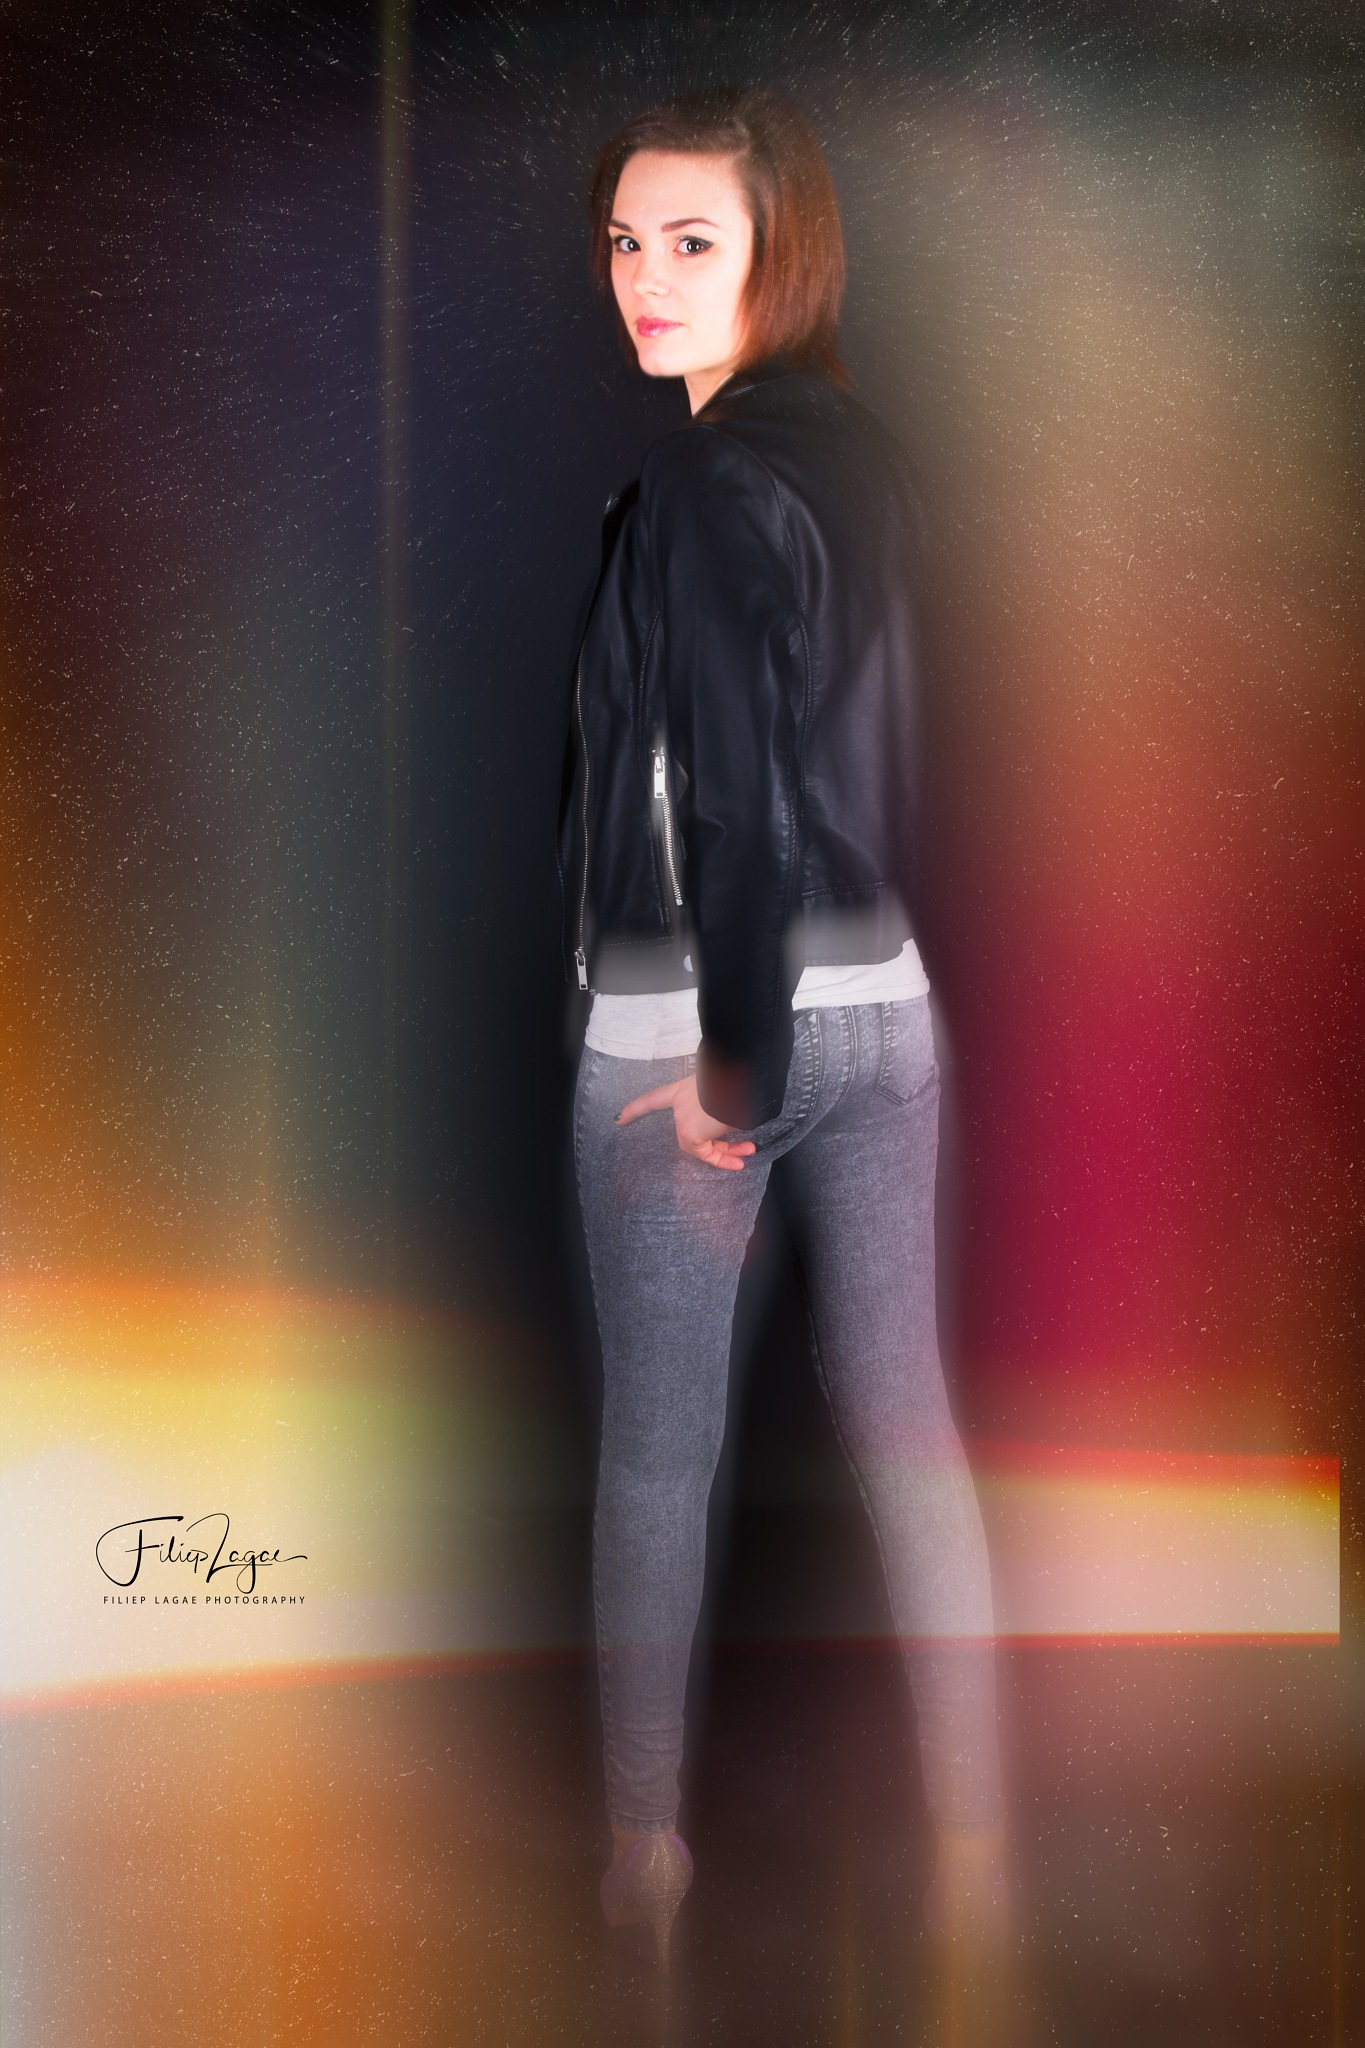 Shine Like The Stars by Fillapics